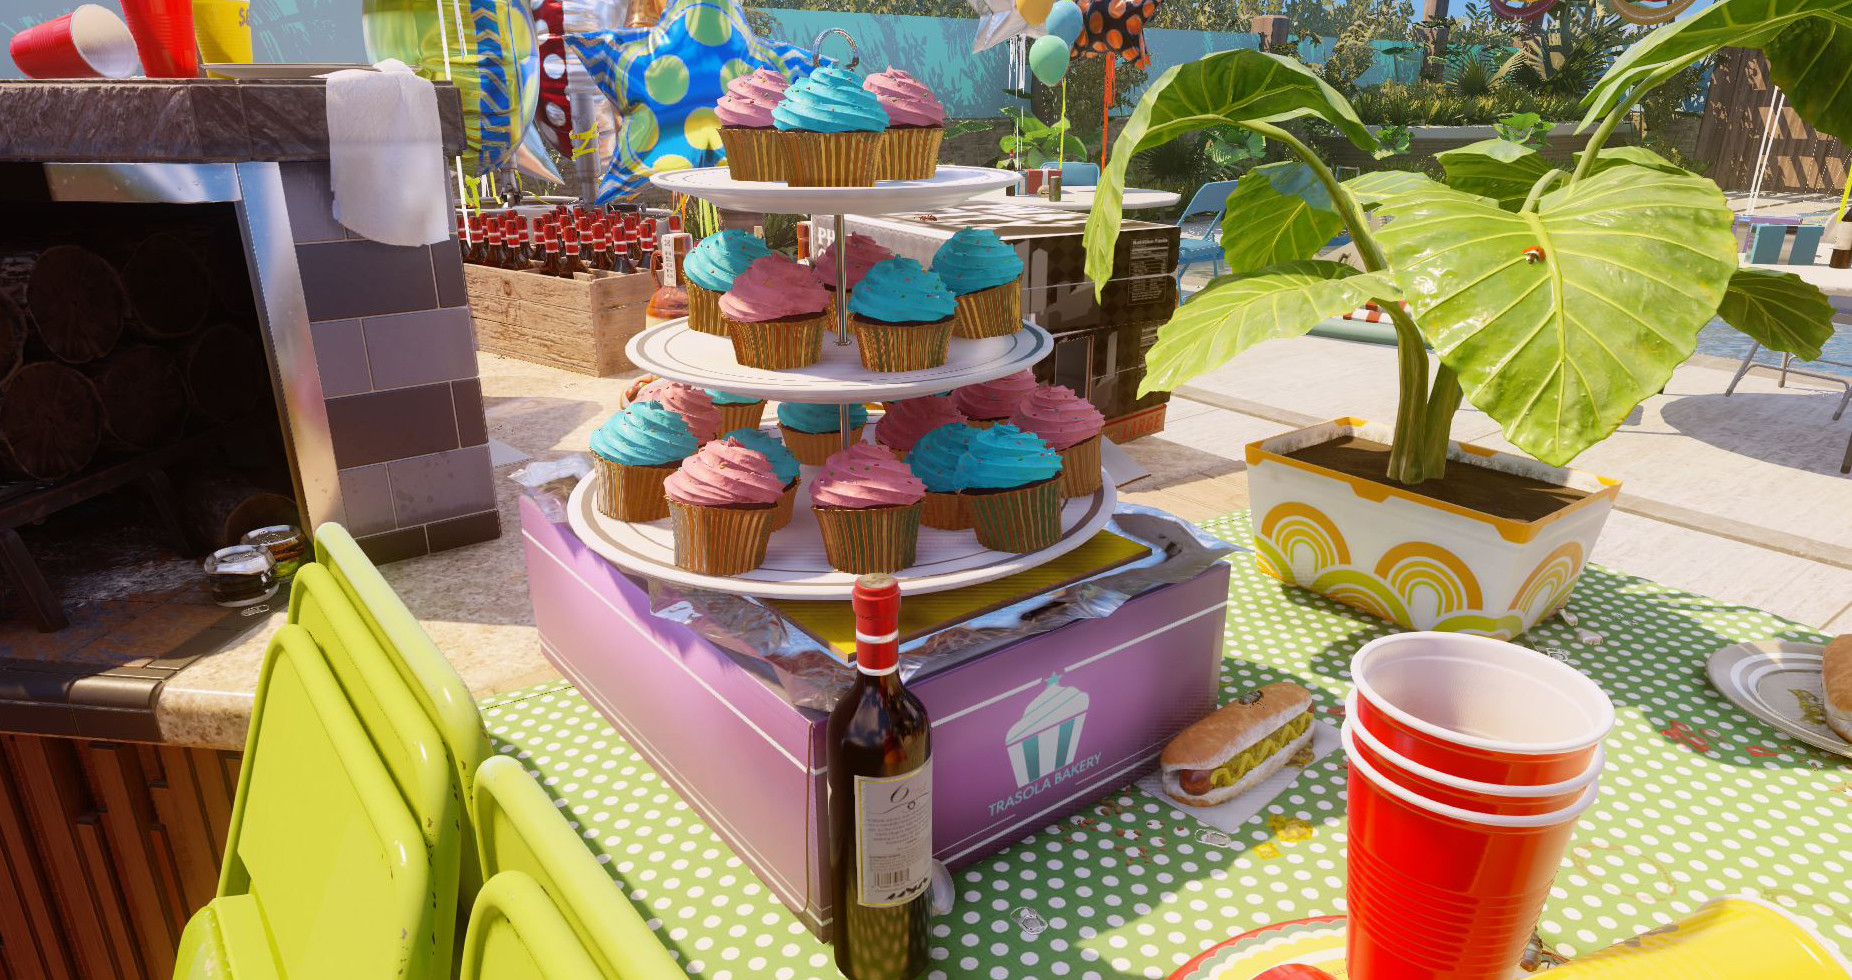 Yoshi vu cupcake tower 05 jpg